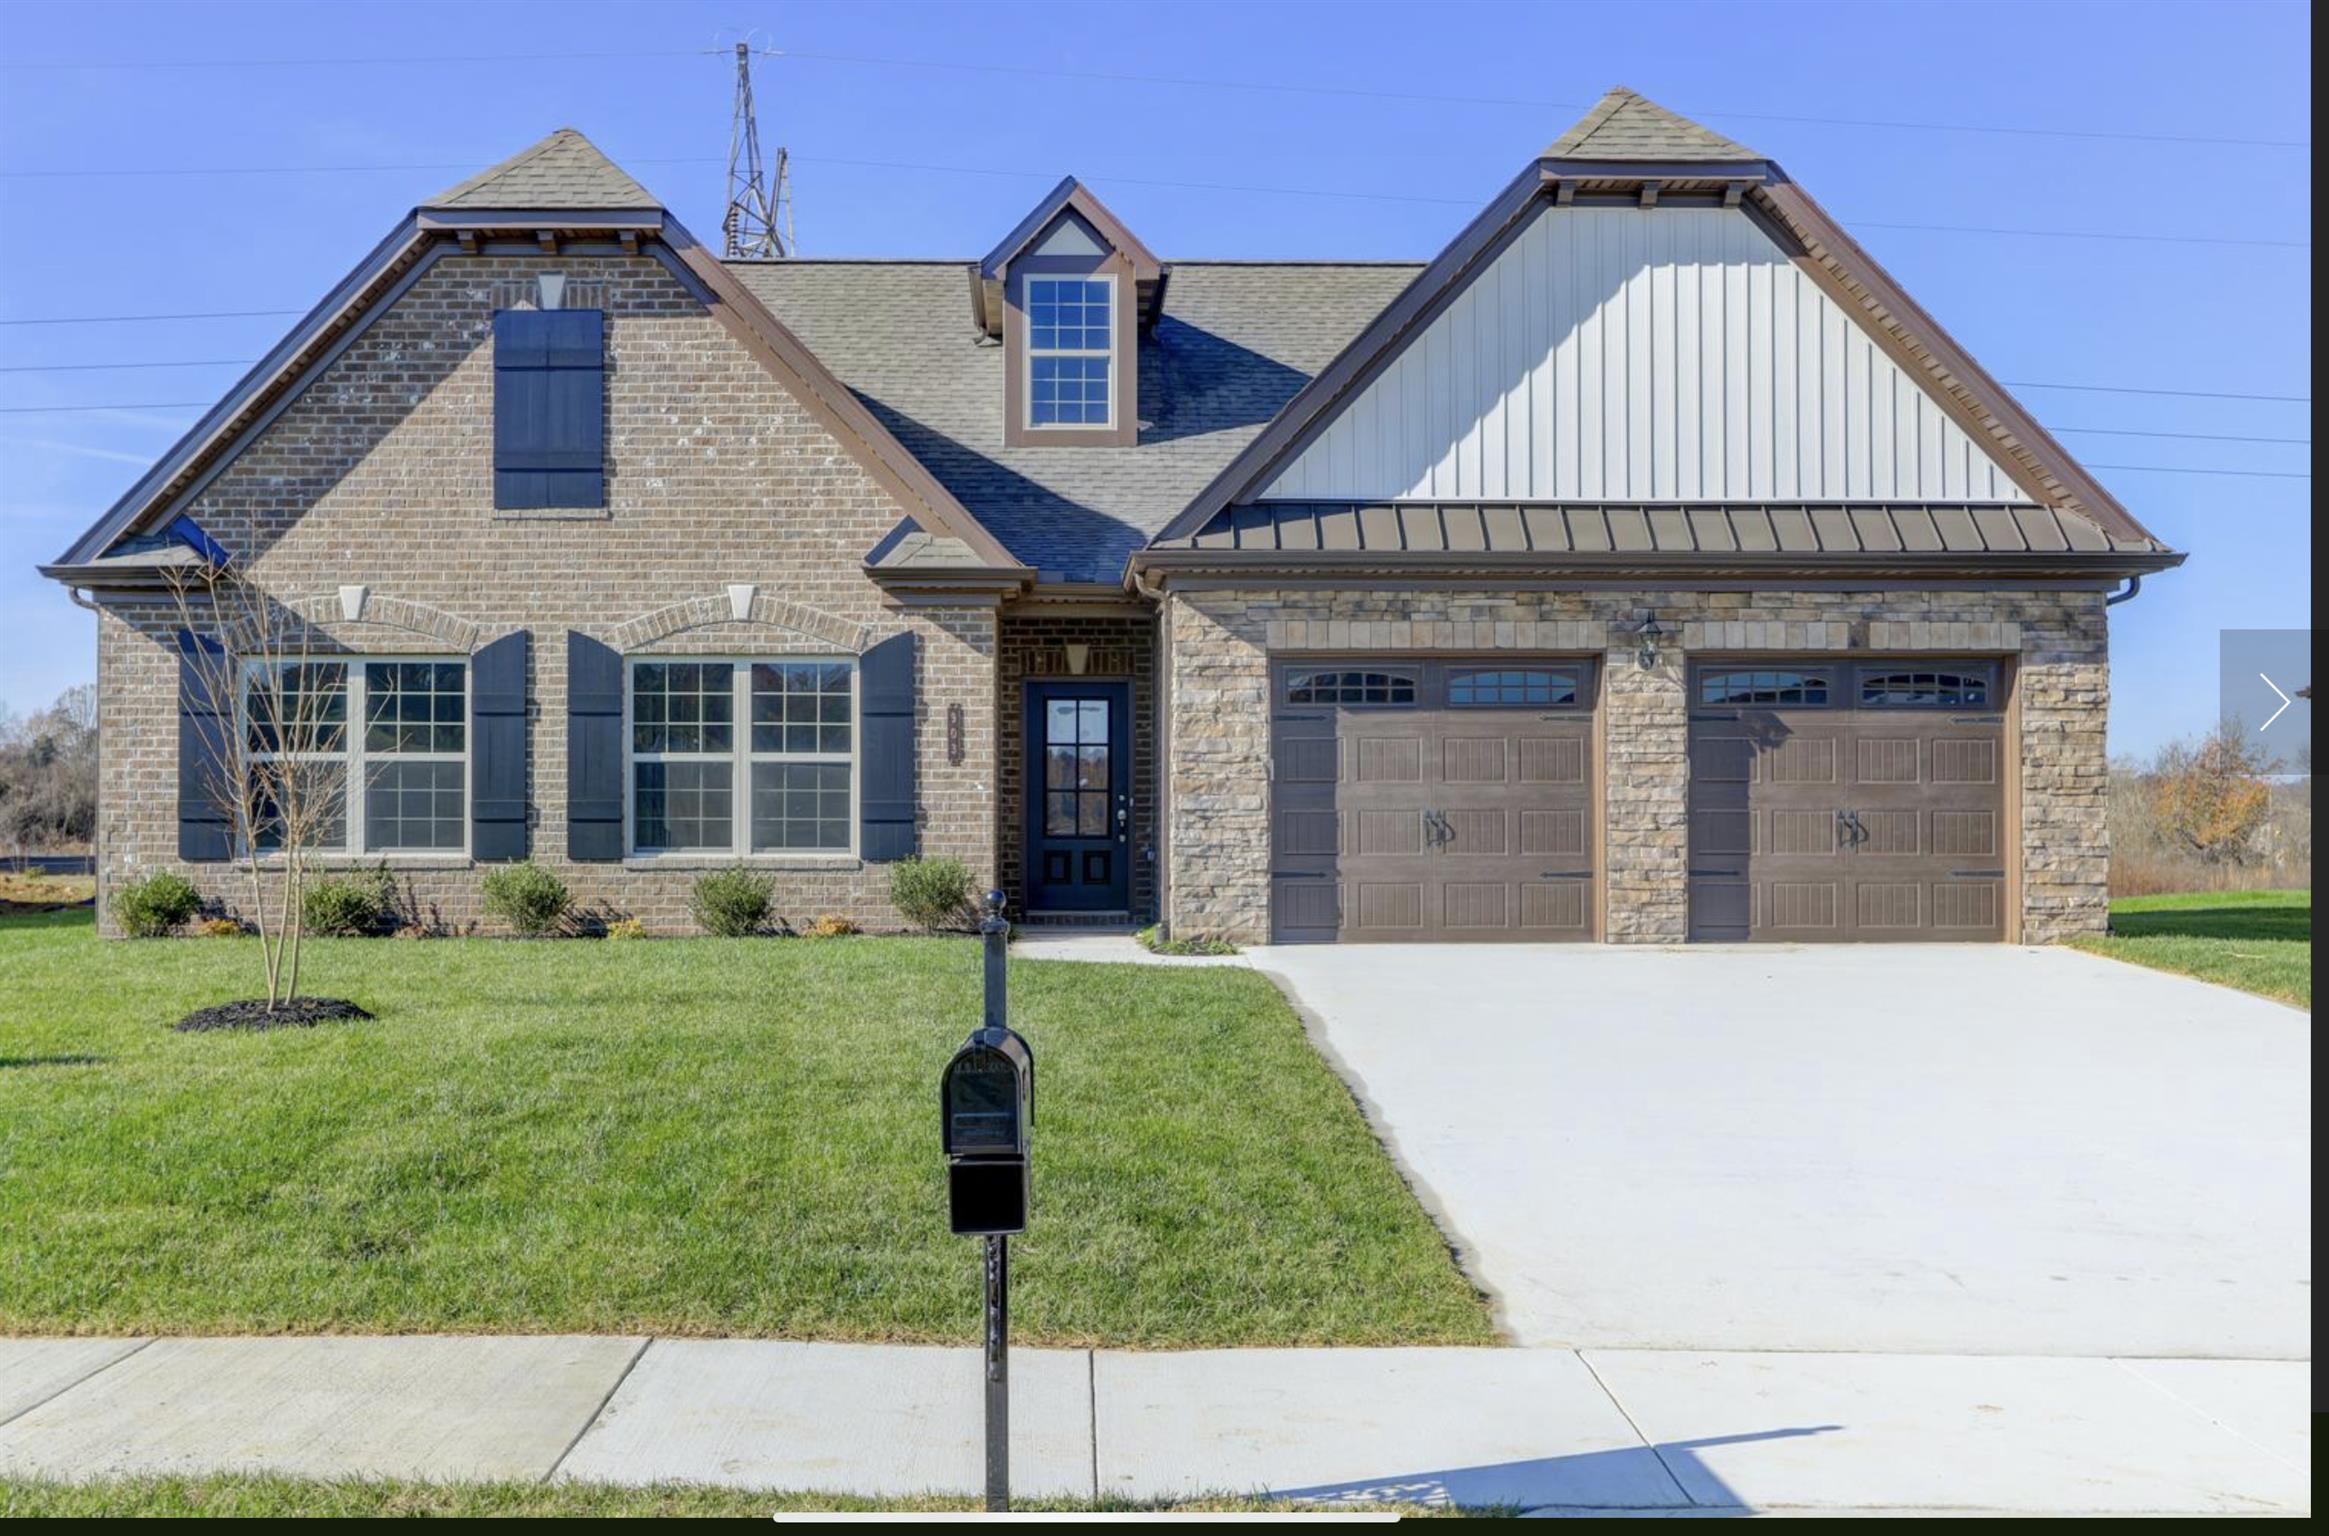 1017 Laurelwood Drive #CF75, Gallatin, TN 37066 - Gallatin, TN real estate listing